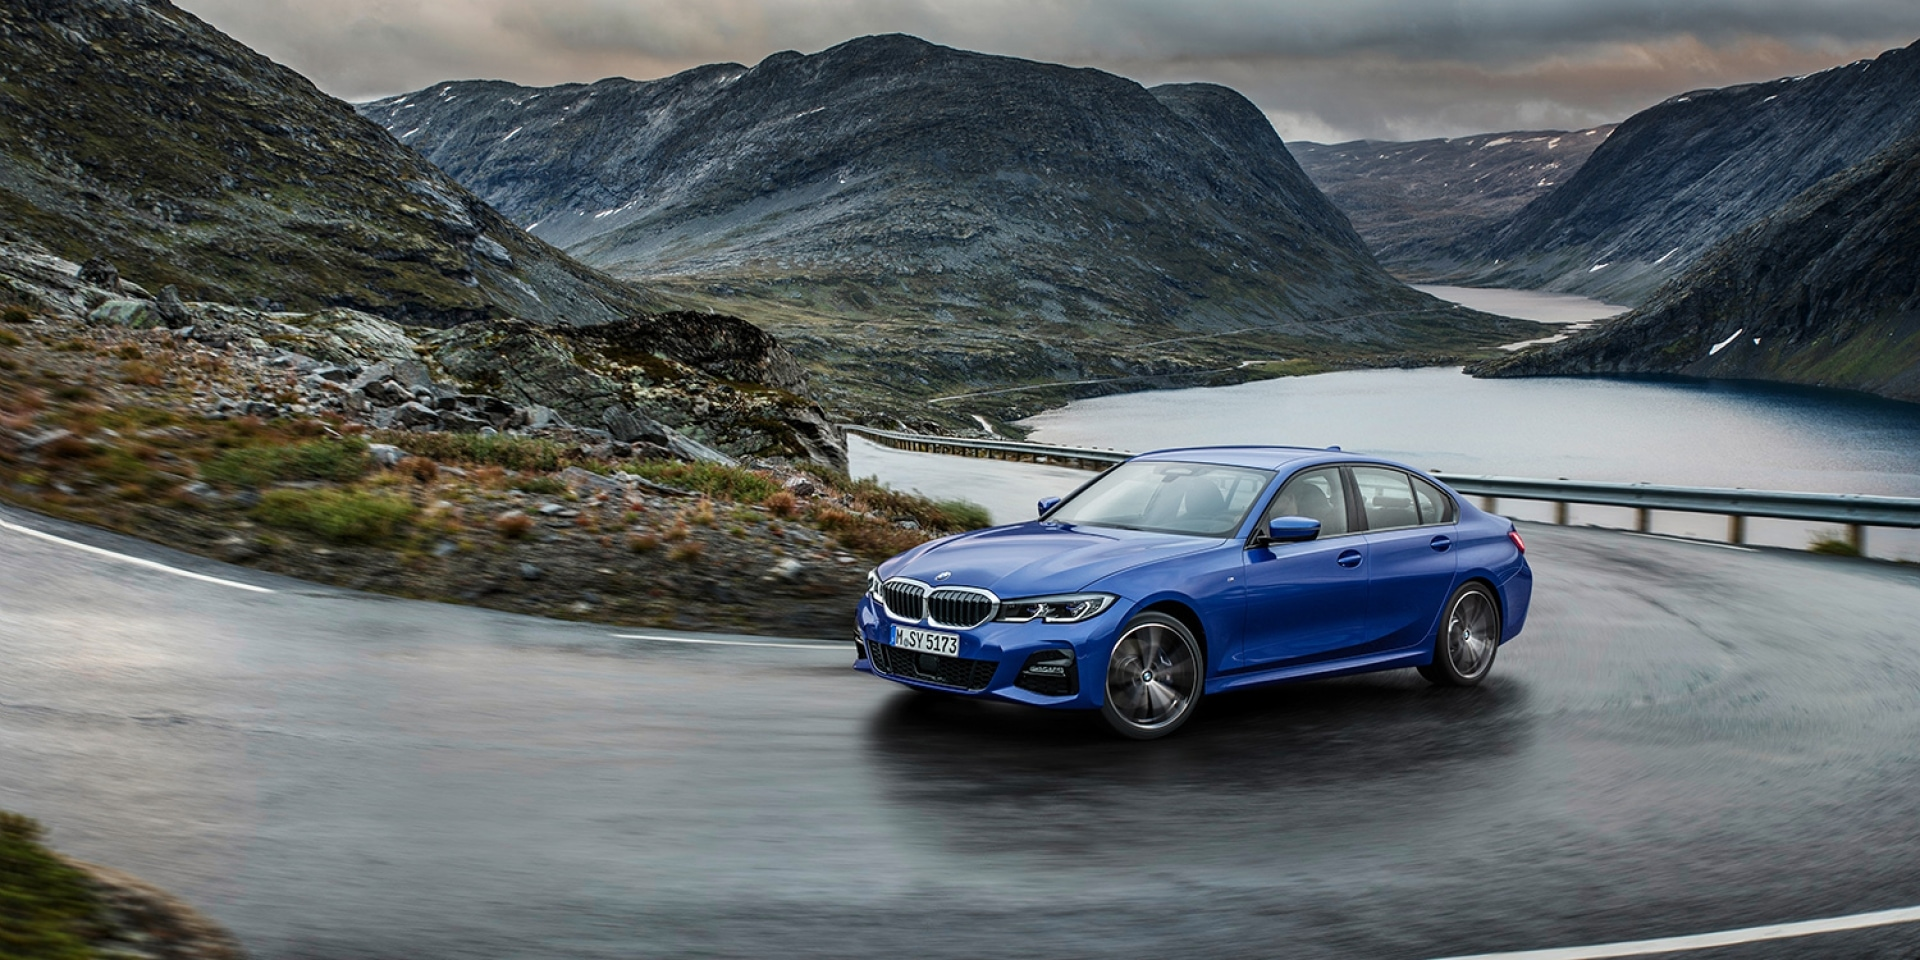 G20 3系列配備全上身,BMW主力戰將正式發表!